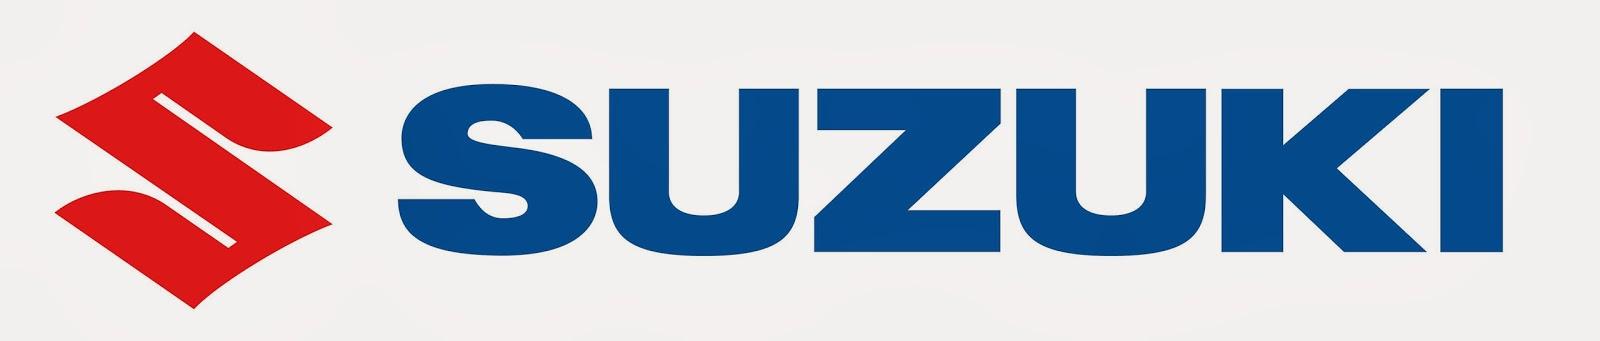 Harga Mobil Suzuki Terbaru